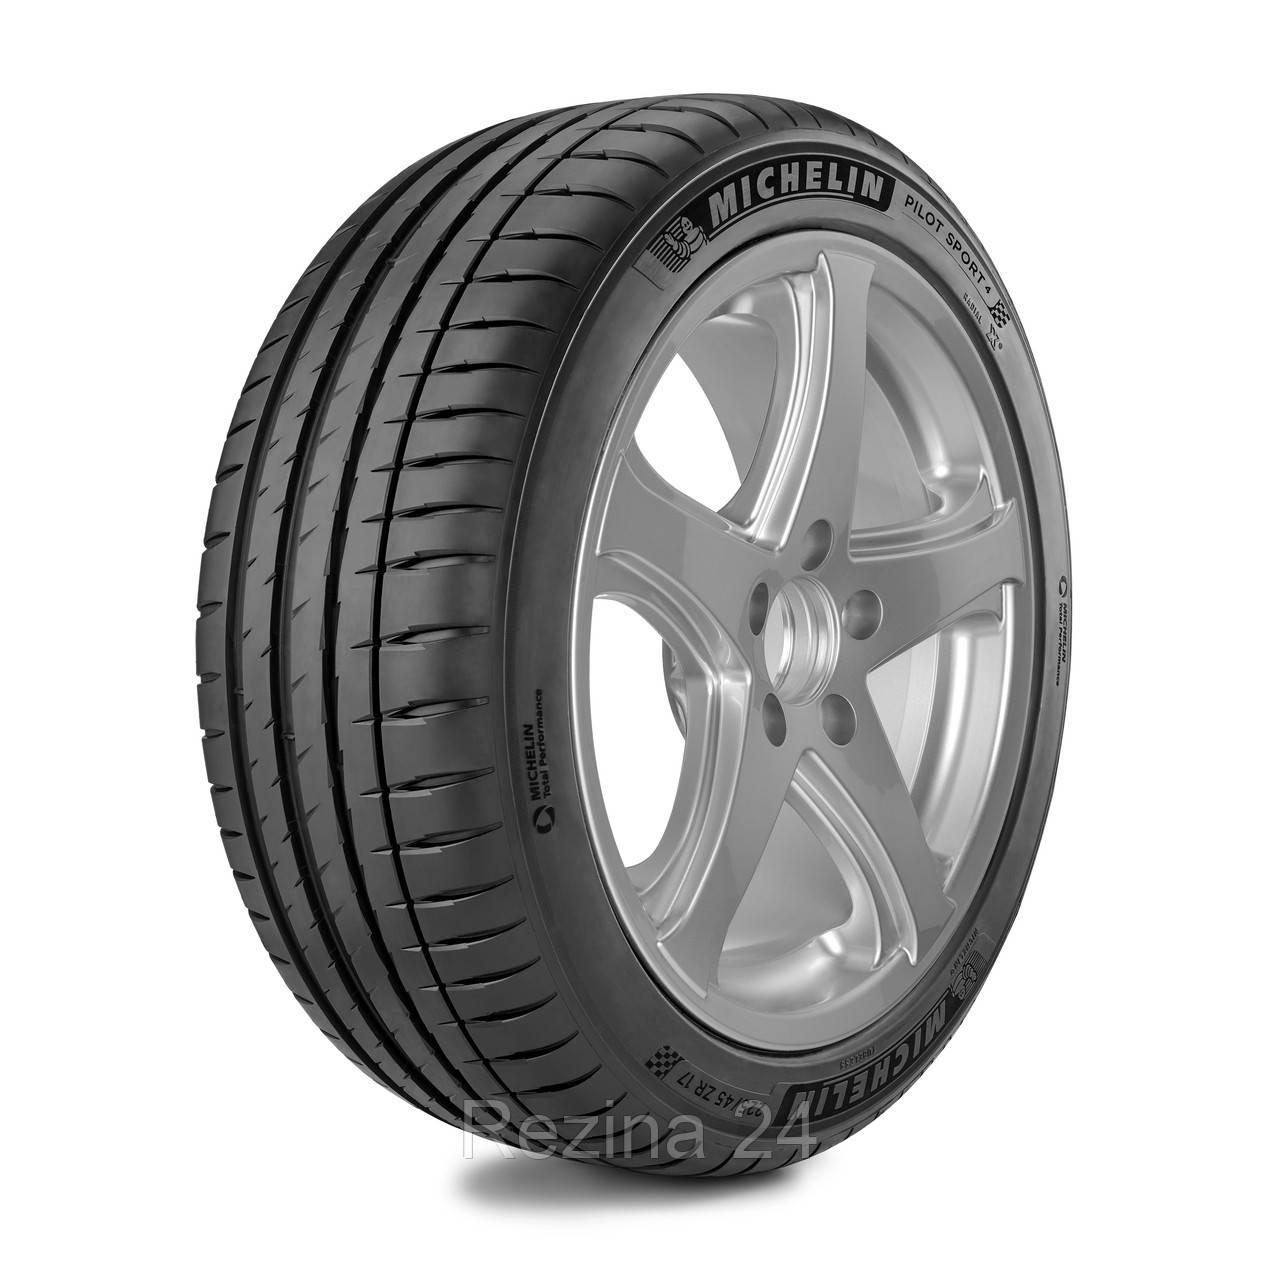 Шины Michelin Pilot Sport PS4 215/45 R18 93Y XL